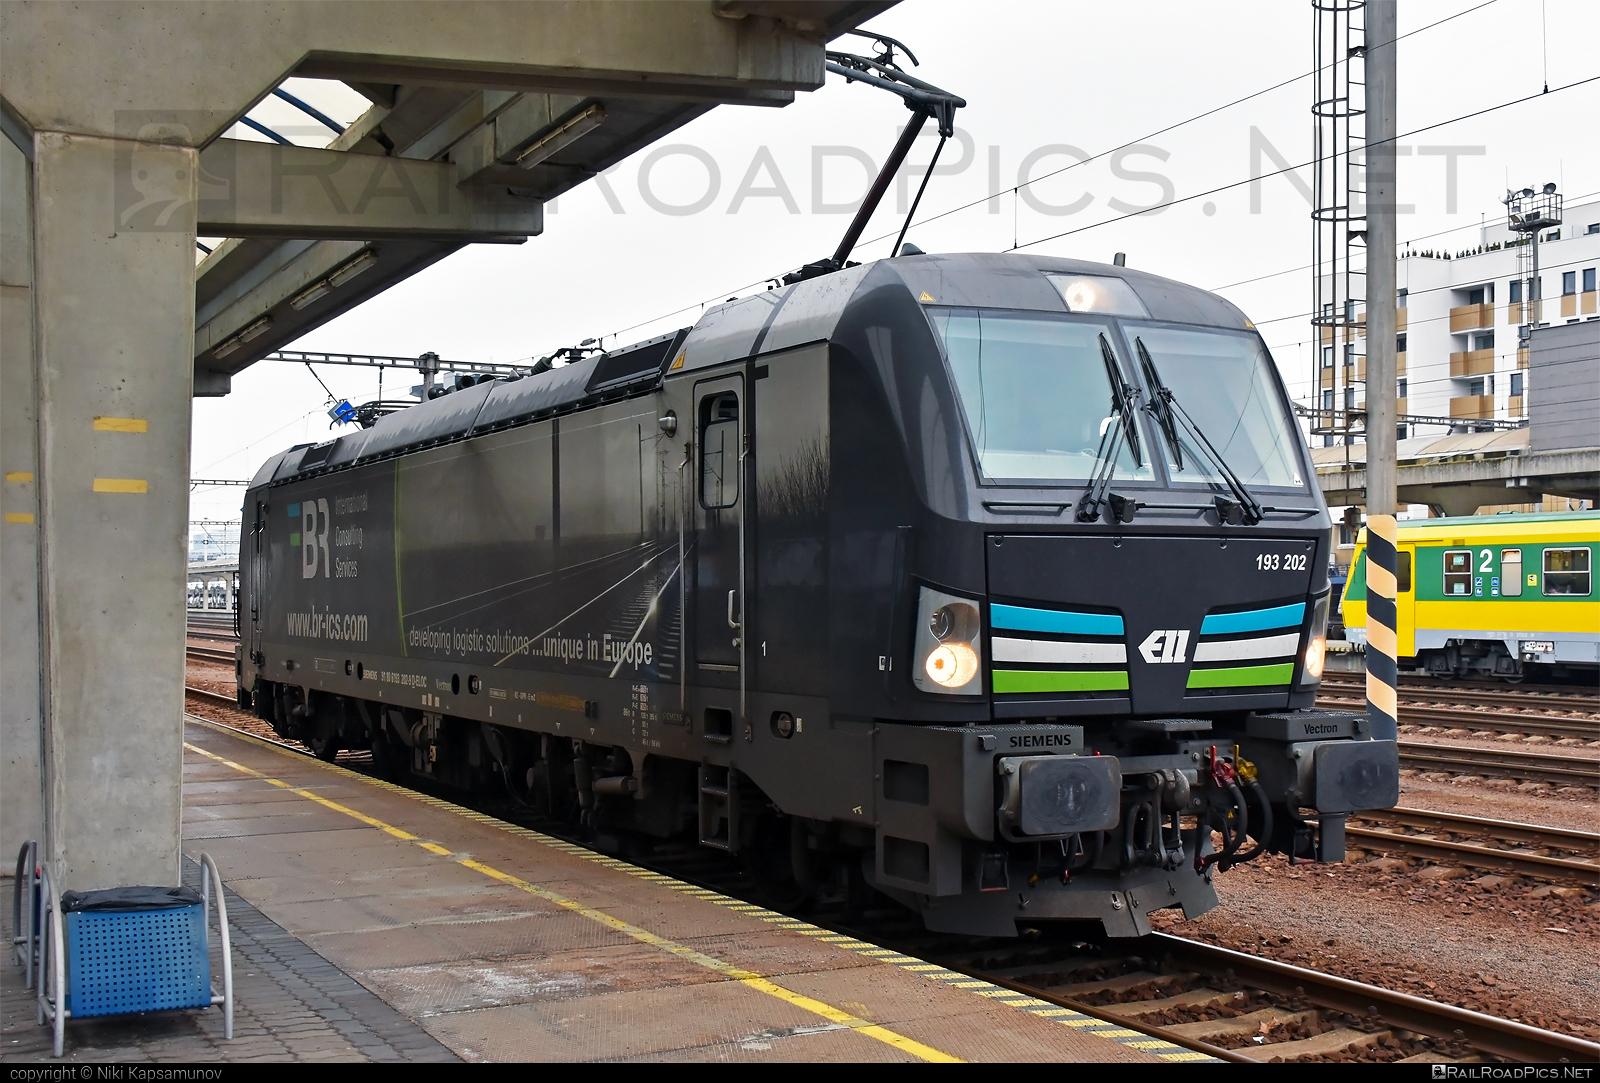 Siemens Vectron AC - 193 202 operated by ecco-rail GmbH #brics #eccorail #eccorailgmbh #ell #ellgermany #eloc #europeanlocomotiveleasing #siemens #siemensvectron #siemensvectronac #vectron #vectronac